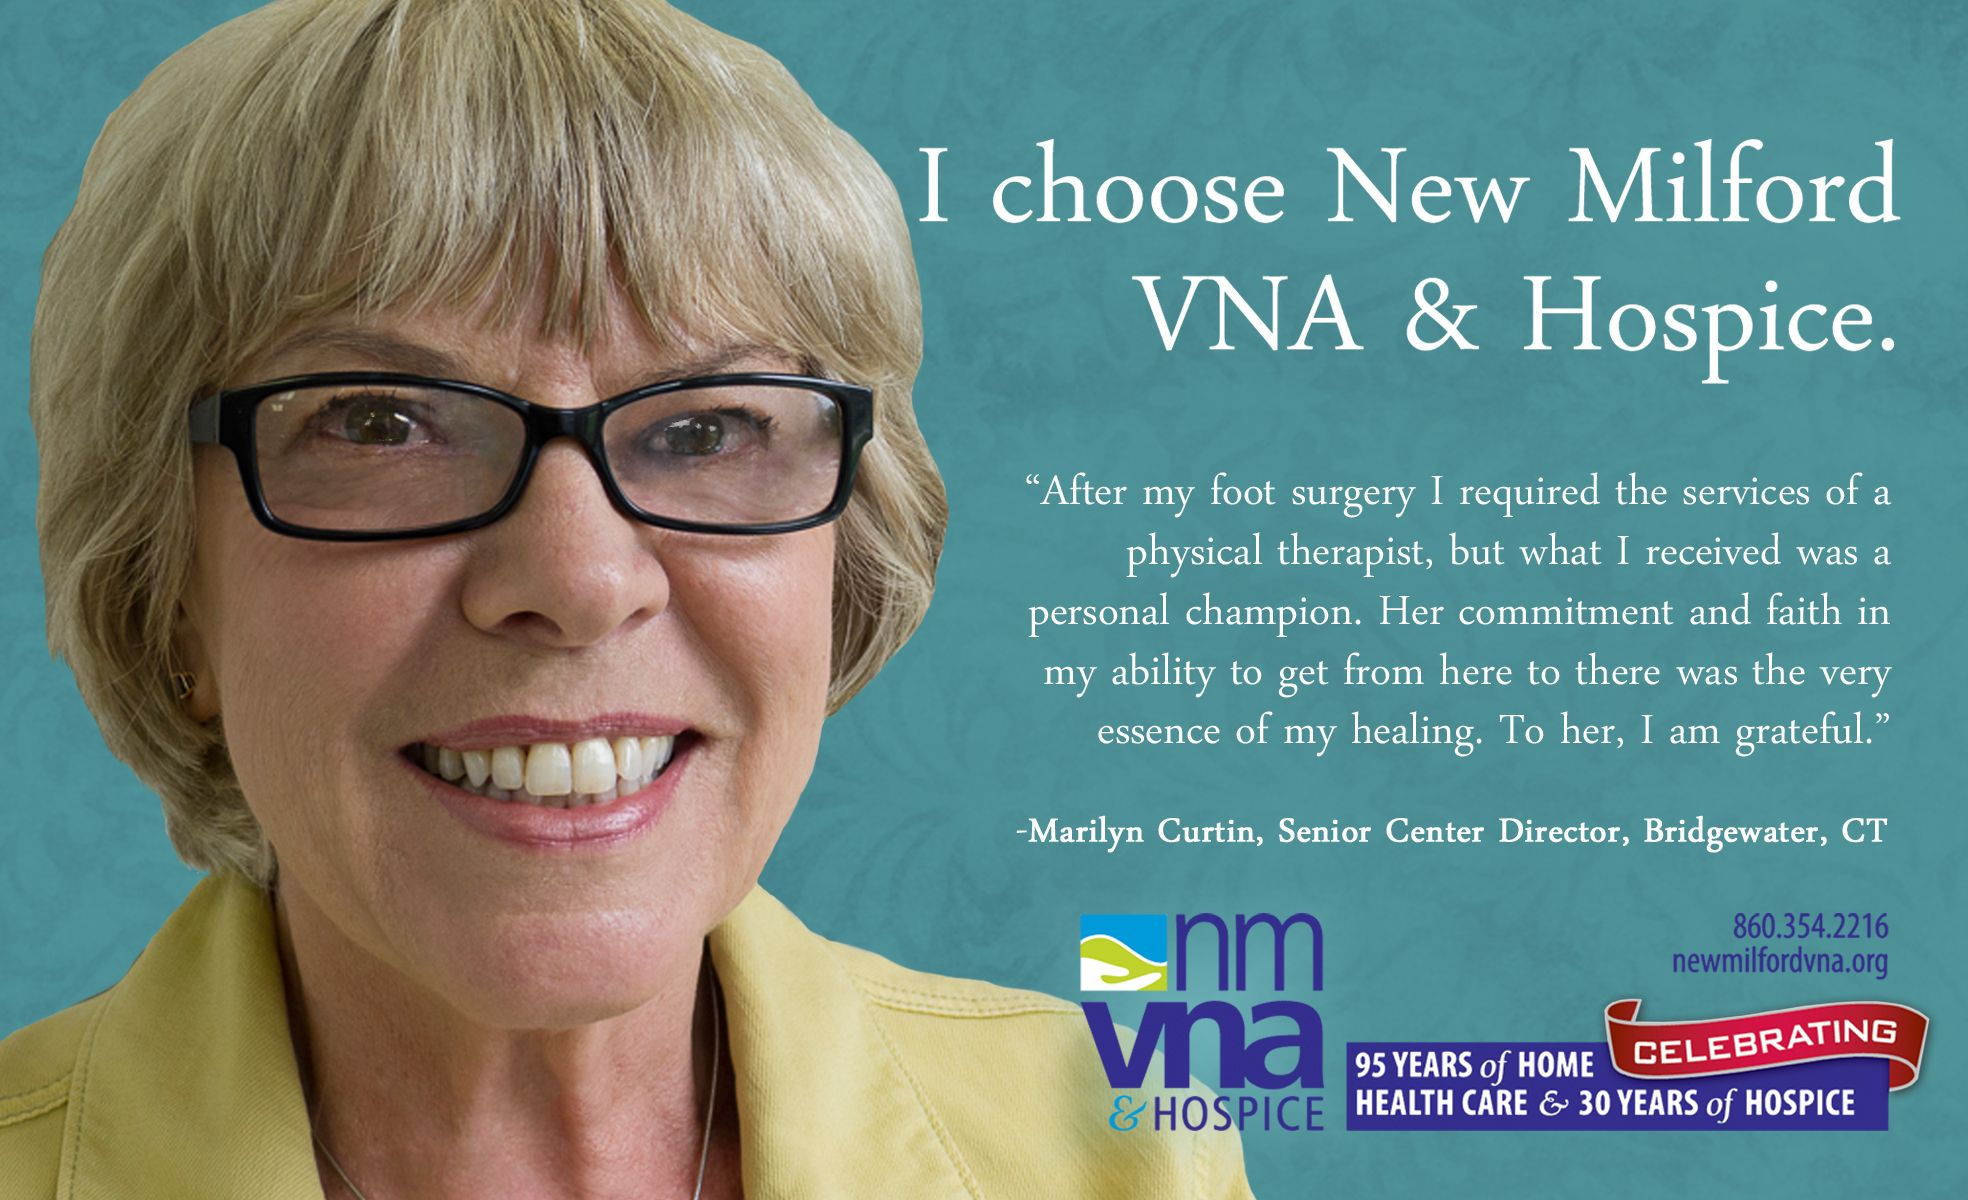 Marilyn Curtin, Senior Services Director Bridgewater, CT